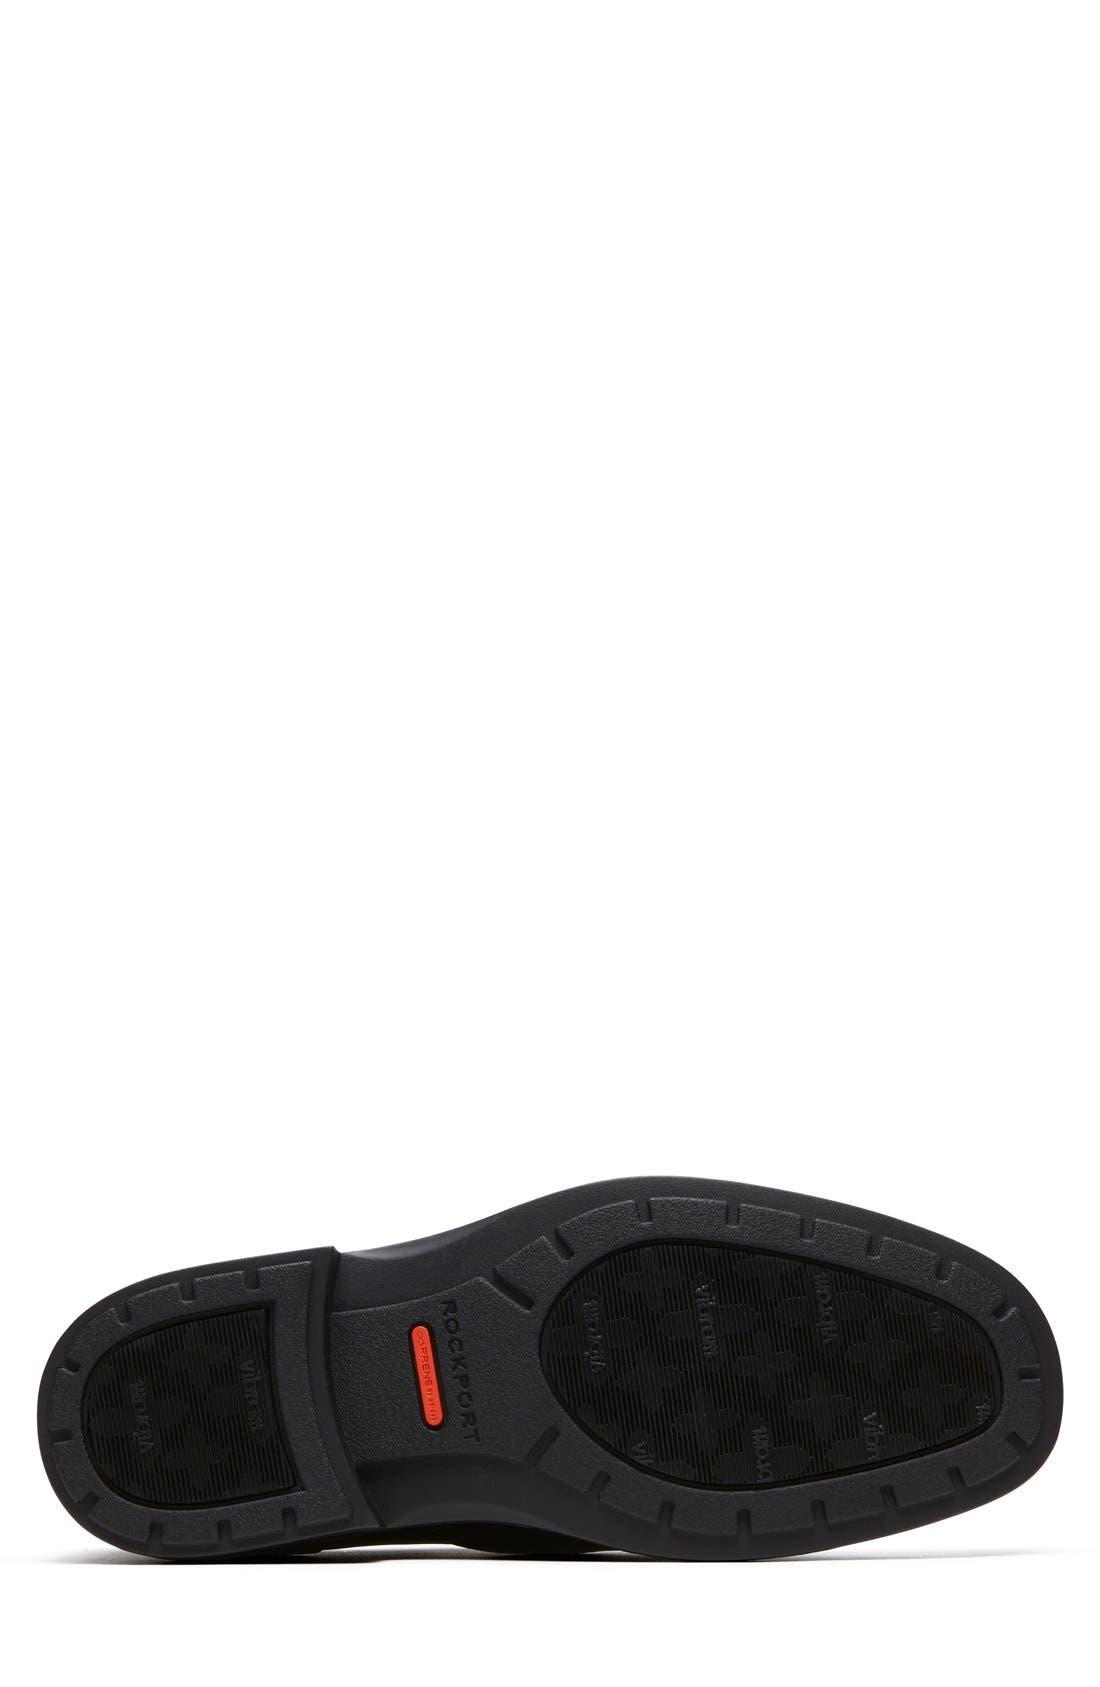 DresSports Luxe Bike Toe Slip-On,                             Alternate thumbnail 3, color,                             BLACK